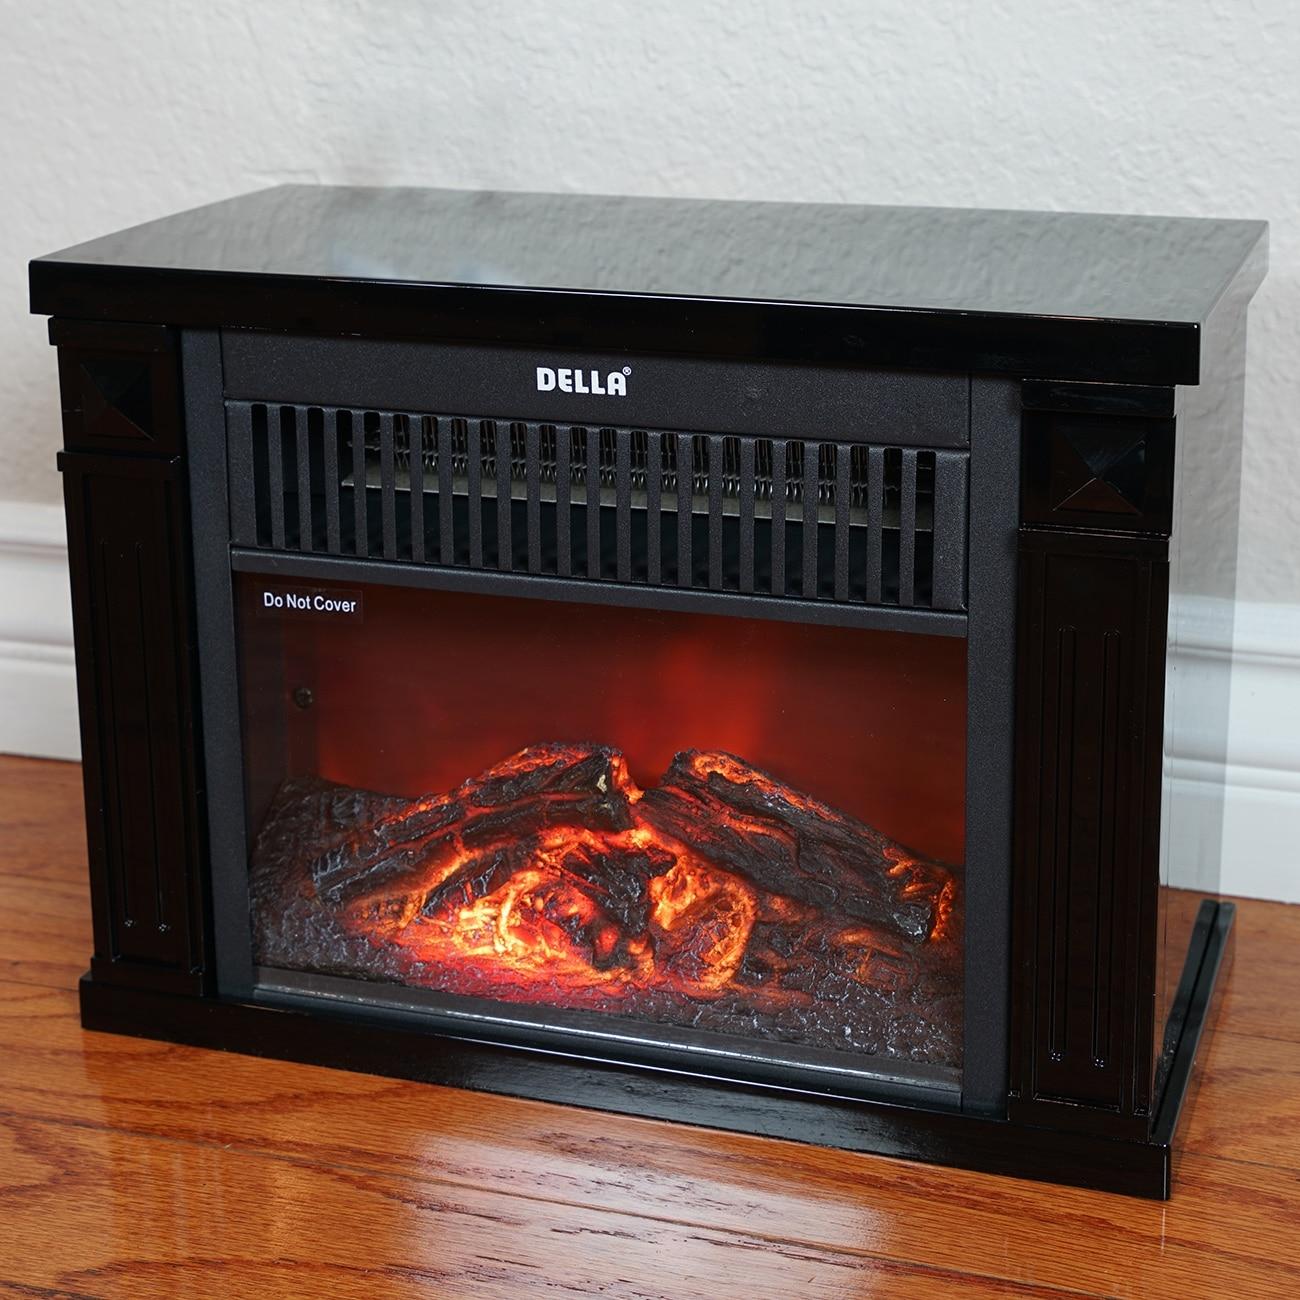 mini electric fireplace heater. Della 1200 Watt Hearth Portable Electric Fireplace Log Flame Mini Desk Tabletop, Black - Free Shipping Today Overstock 22281873 Heater